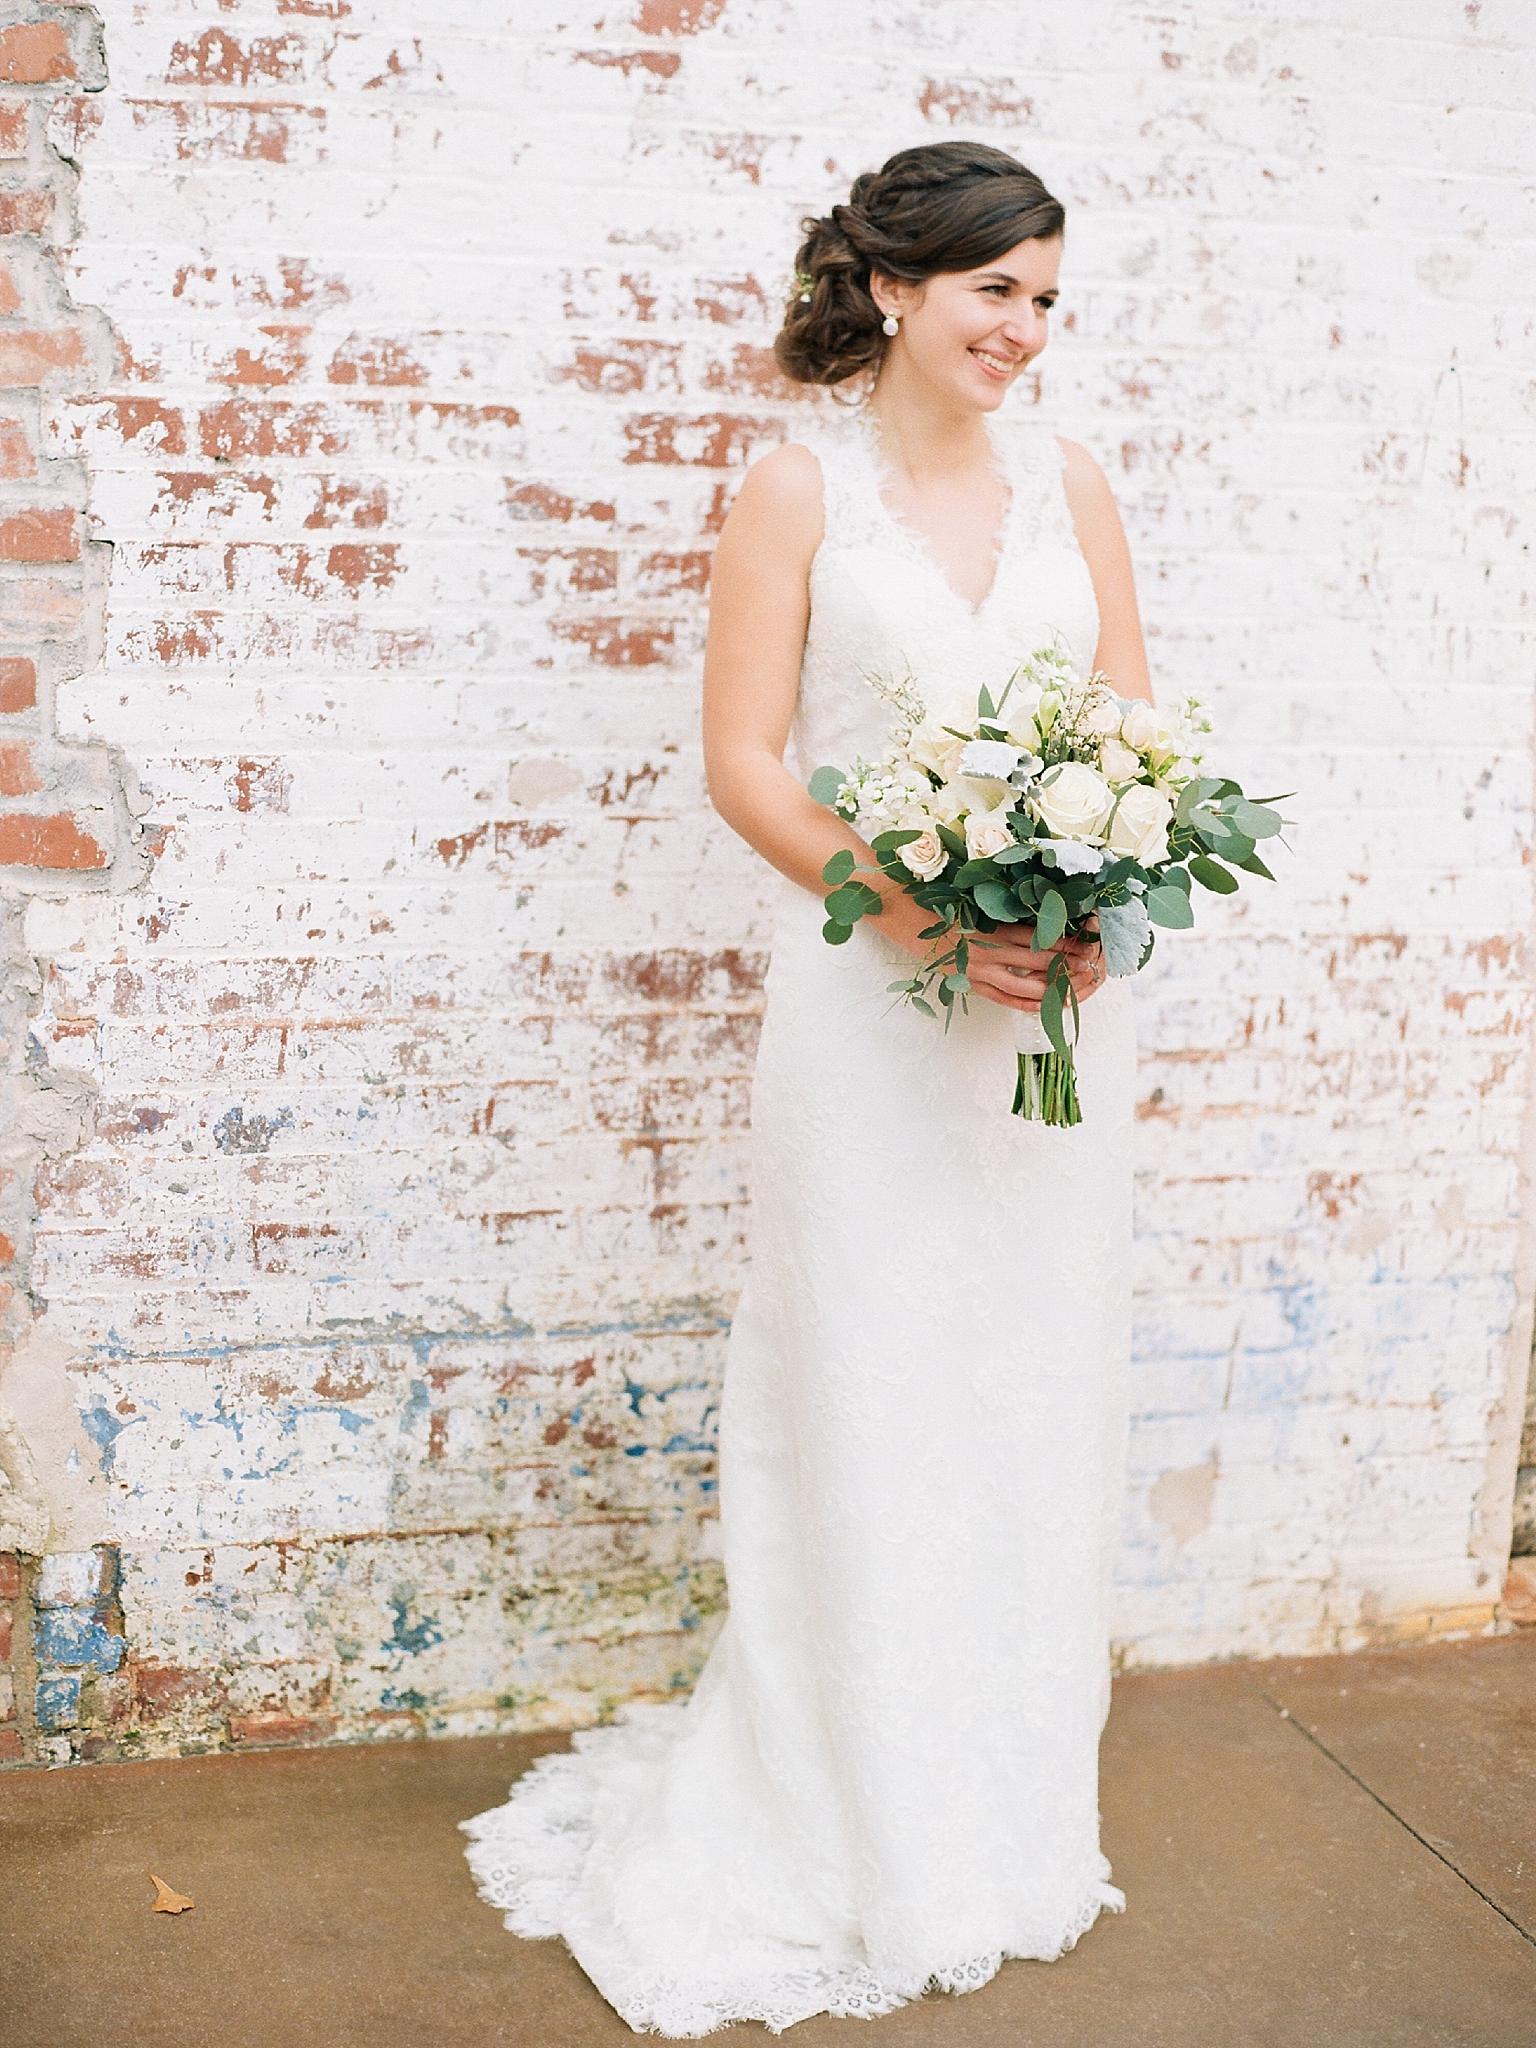 The Engine Room Atlanta Wedding Photographer Christina Pugh 36.jpg